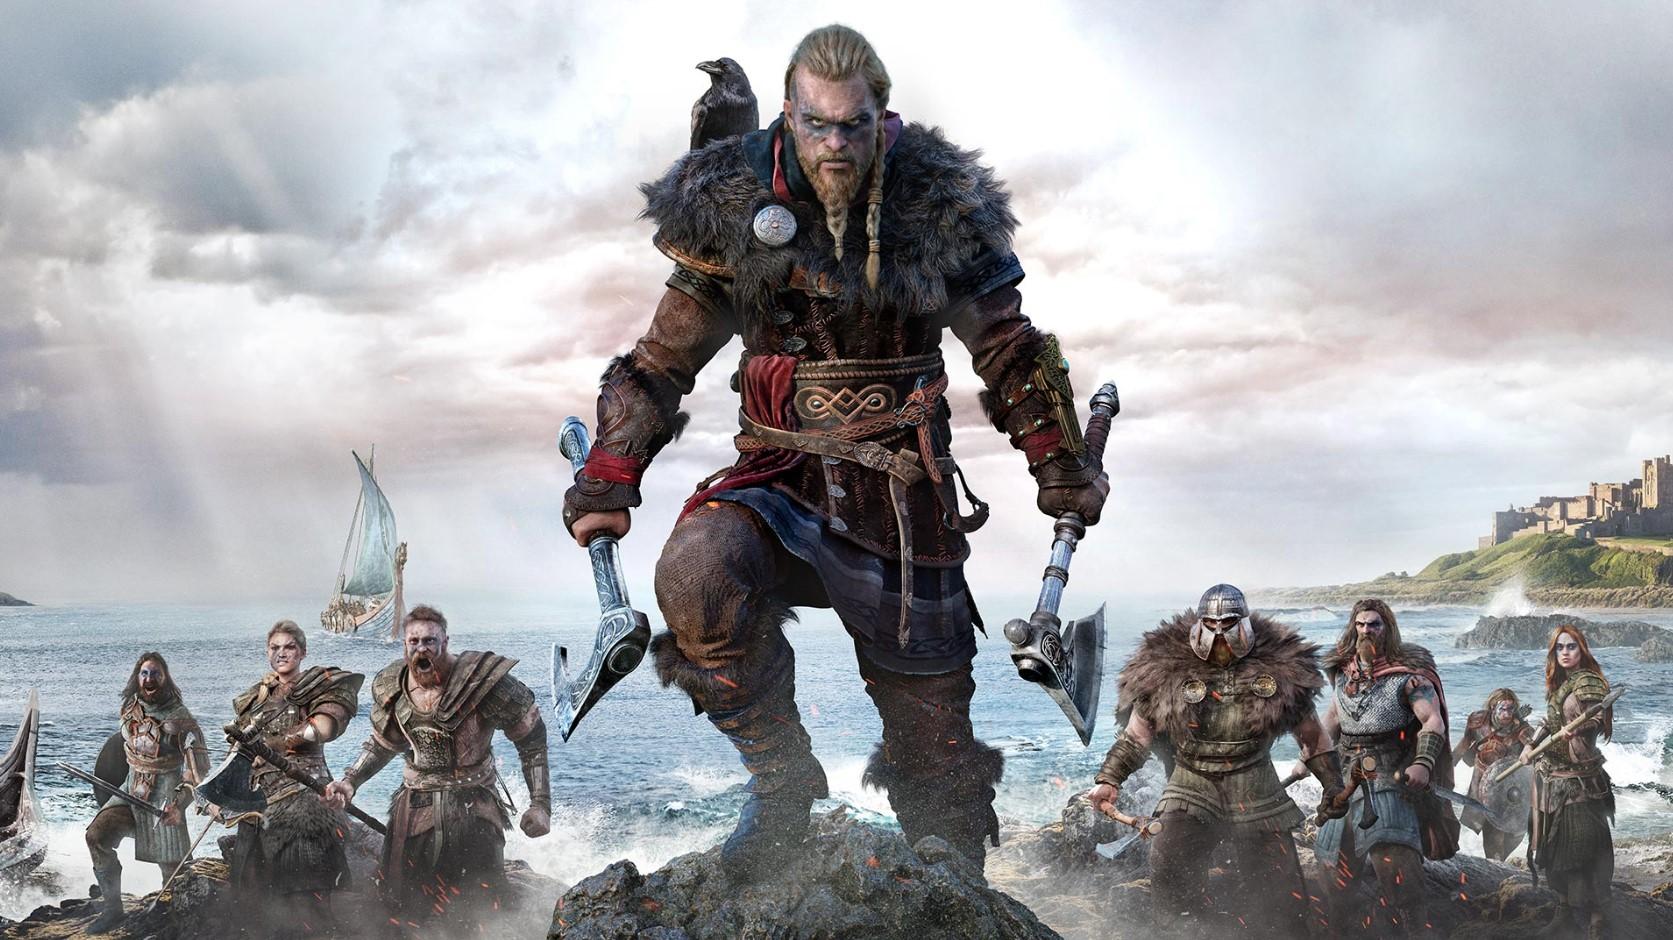 Пошумим: Assassin's Creed Valhalla получит аналог рэп-баттлов среди викингов